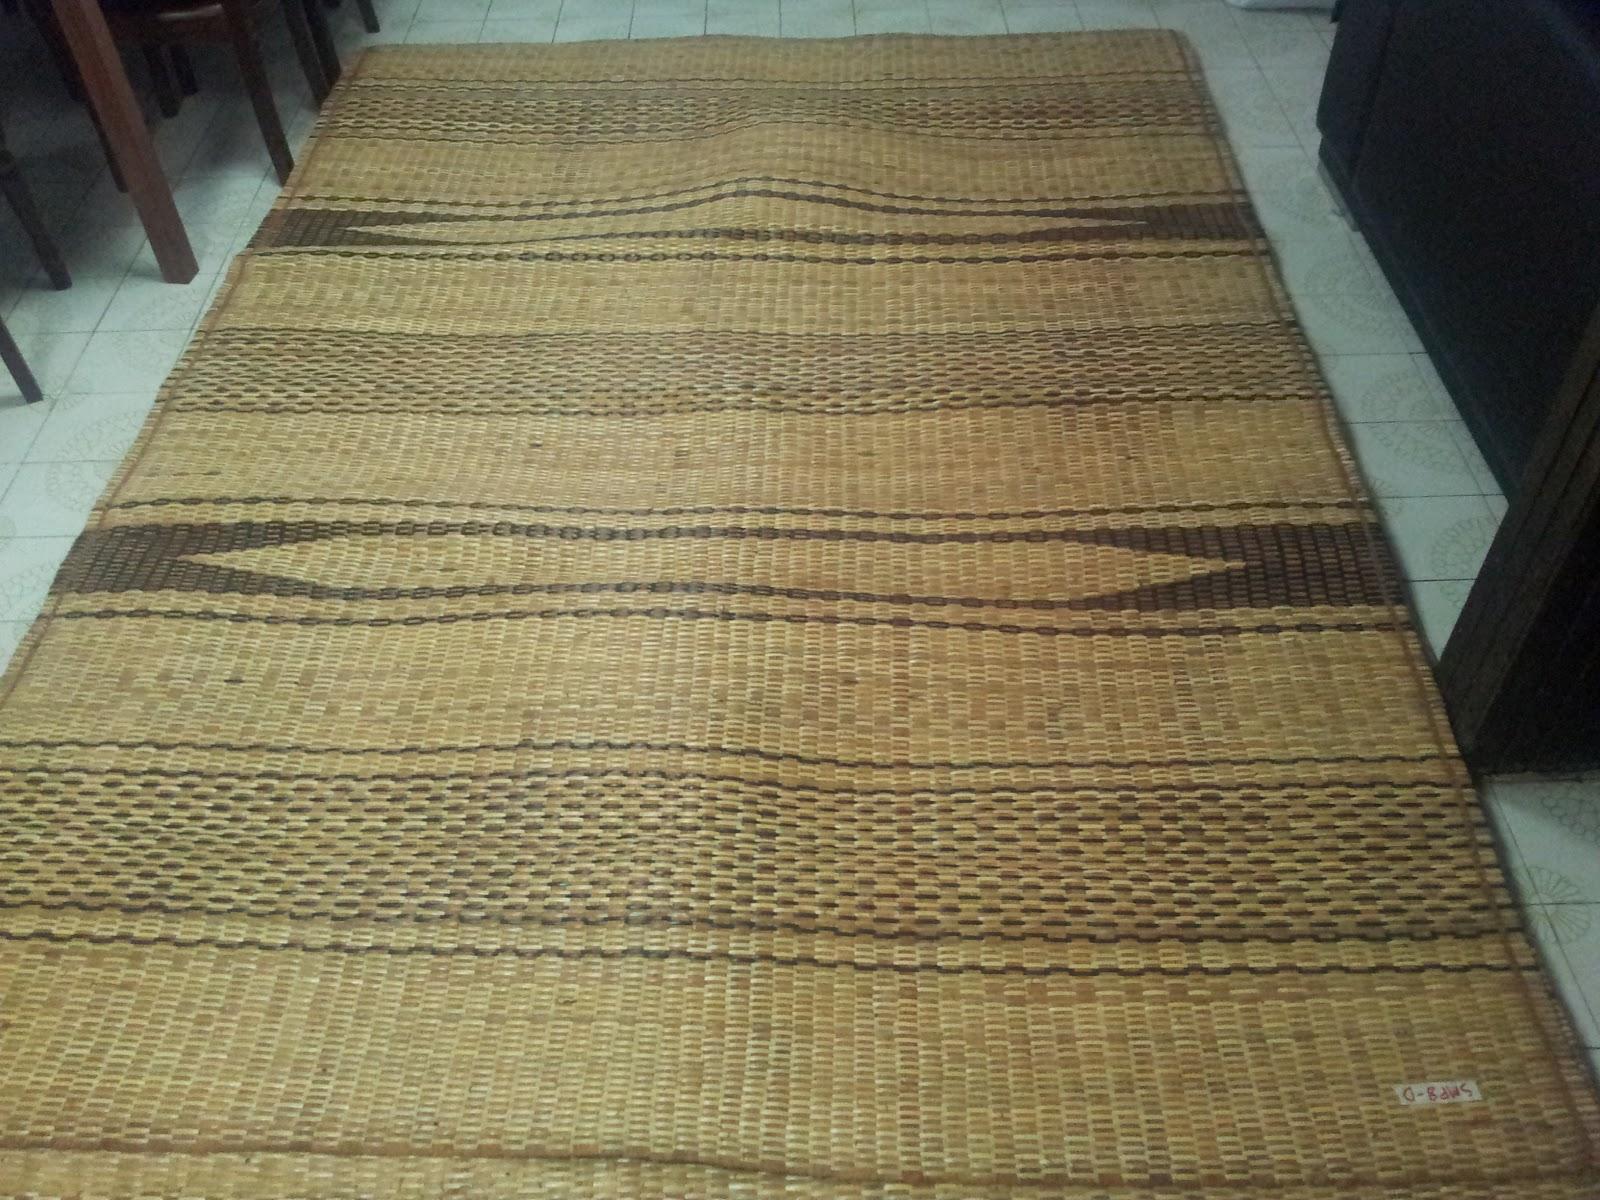 kraftangan borneo batik sarawak tikar sarawak pua kumbu